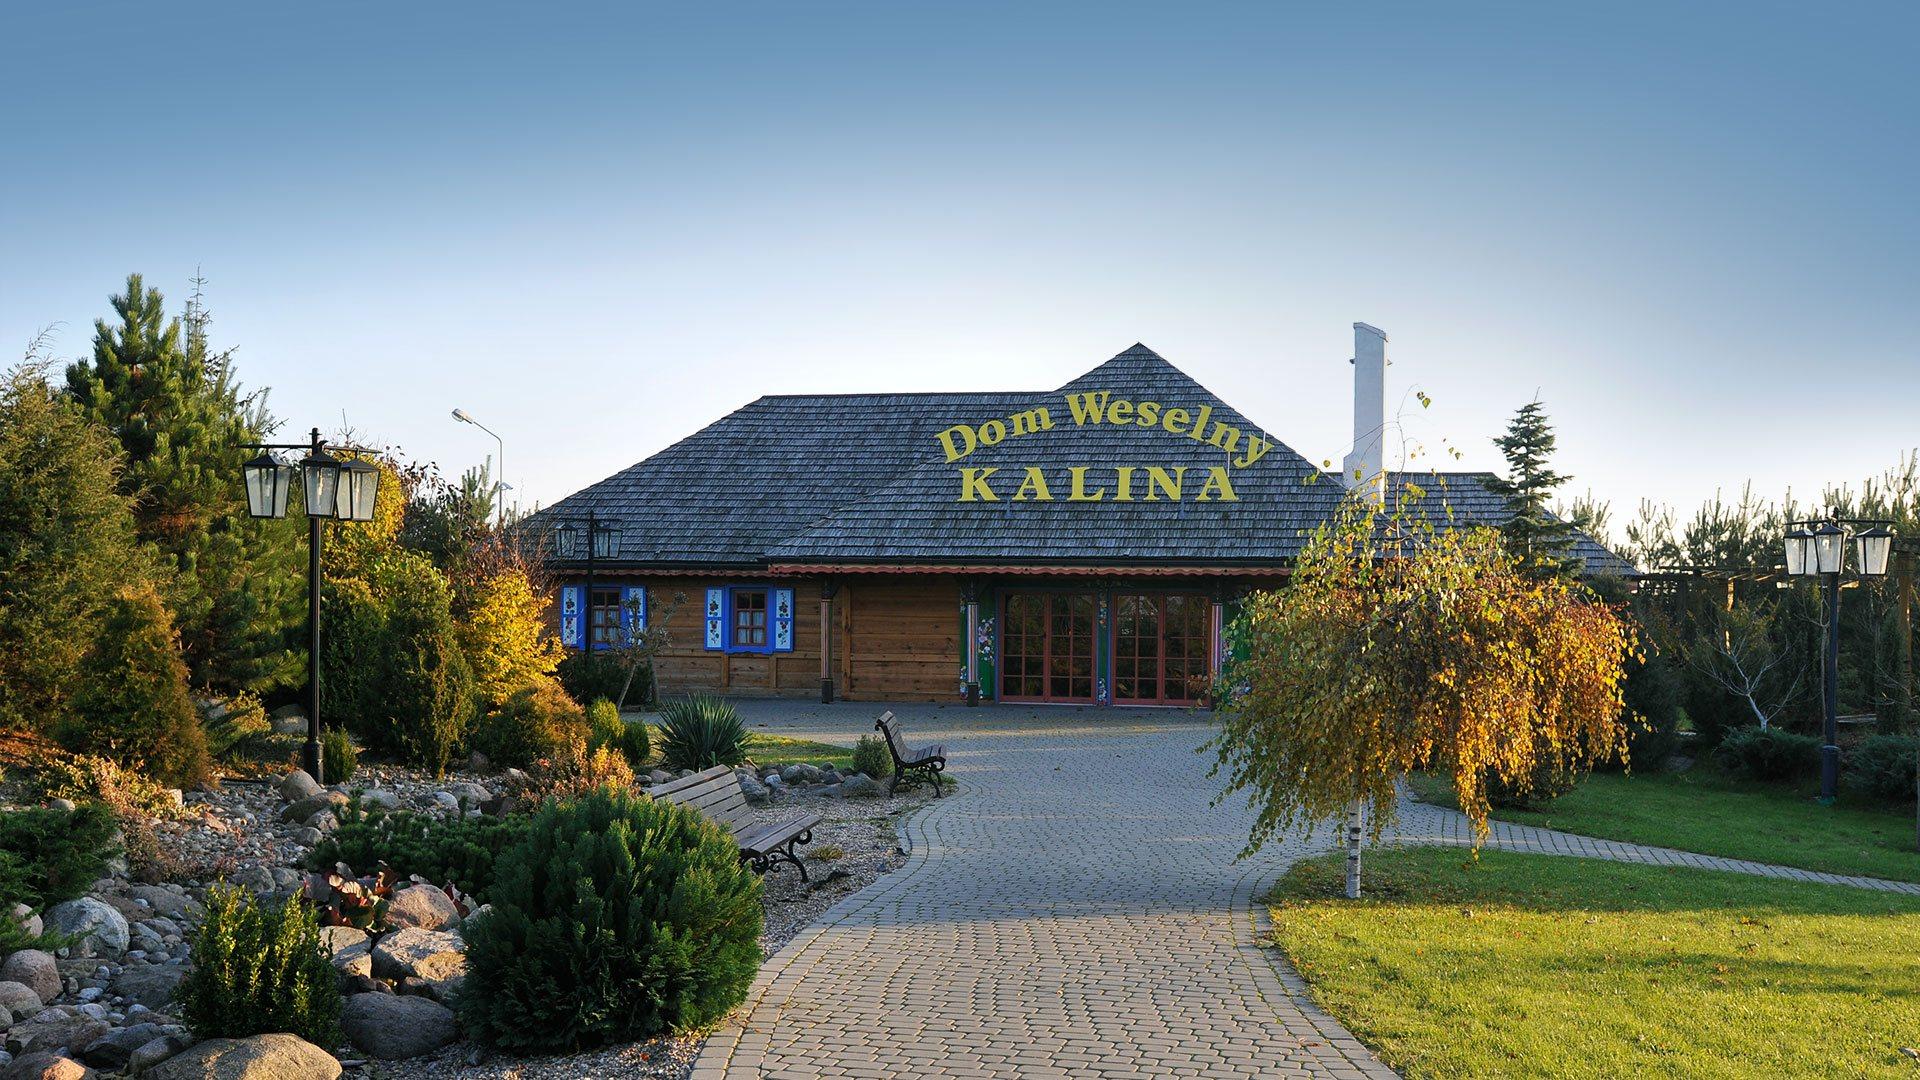 bg2-dom-weselny-kalina